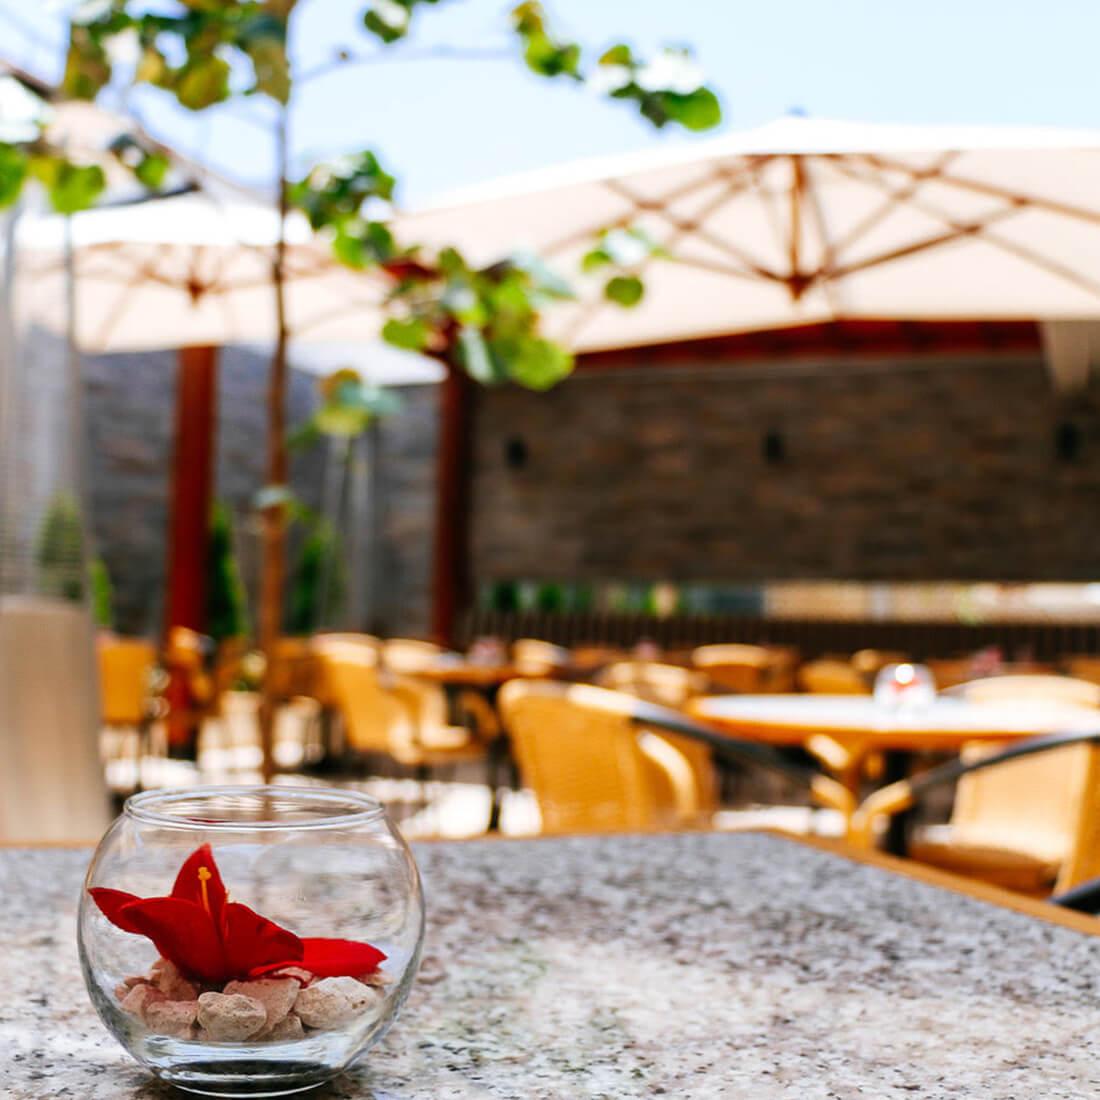 LA GIOCONDA Restaurante - Reserva en restaurantes de Comida ITALIANA - SAN ISIDRO - MESA 24/7 | LIMA - Perú